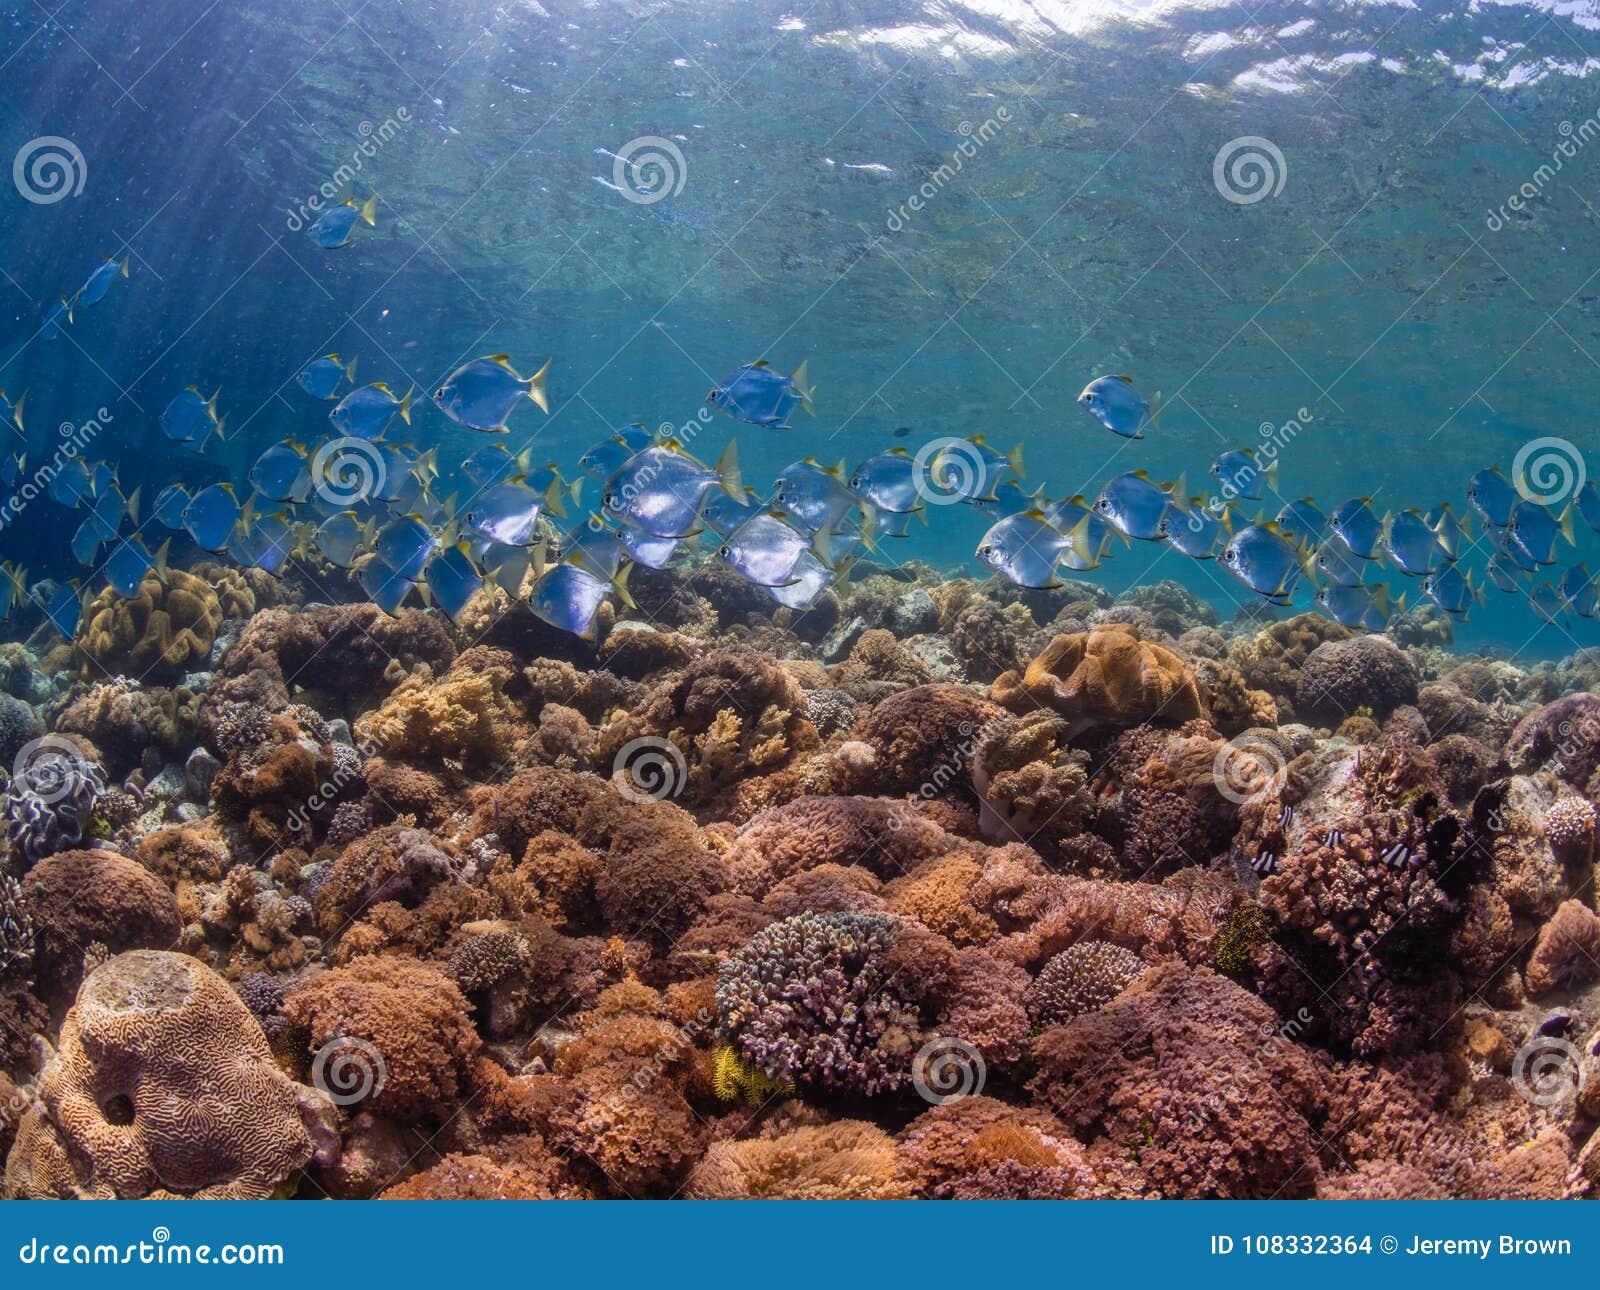 School of diamondfish on a pristine tropical coral reef